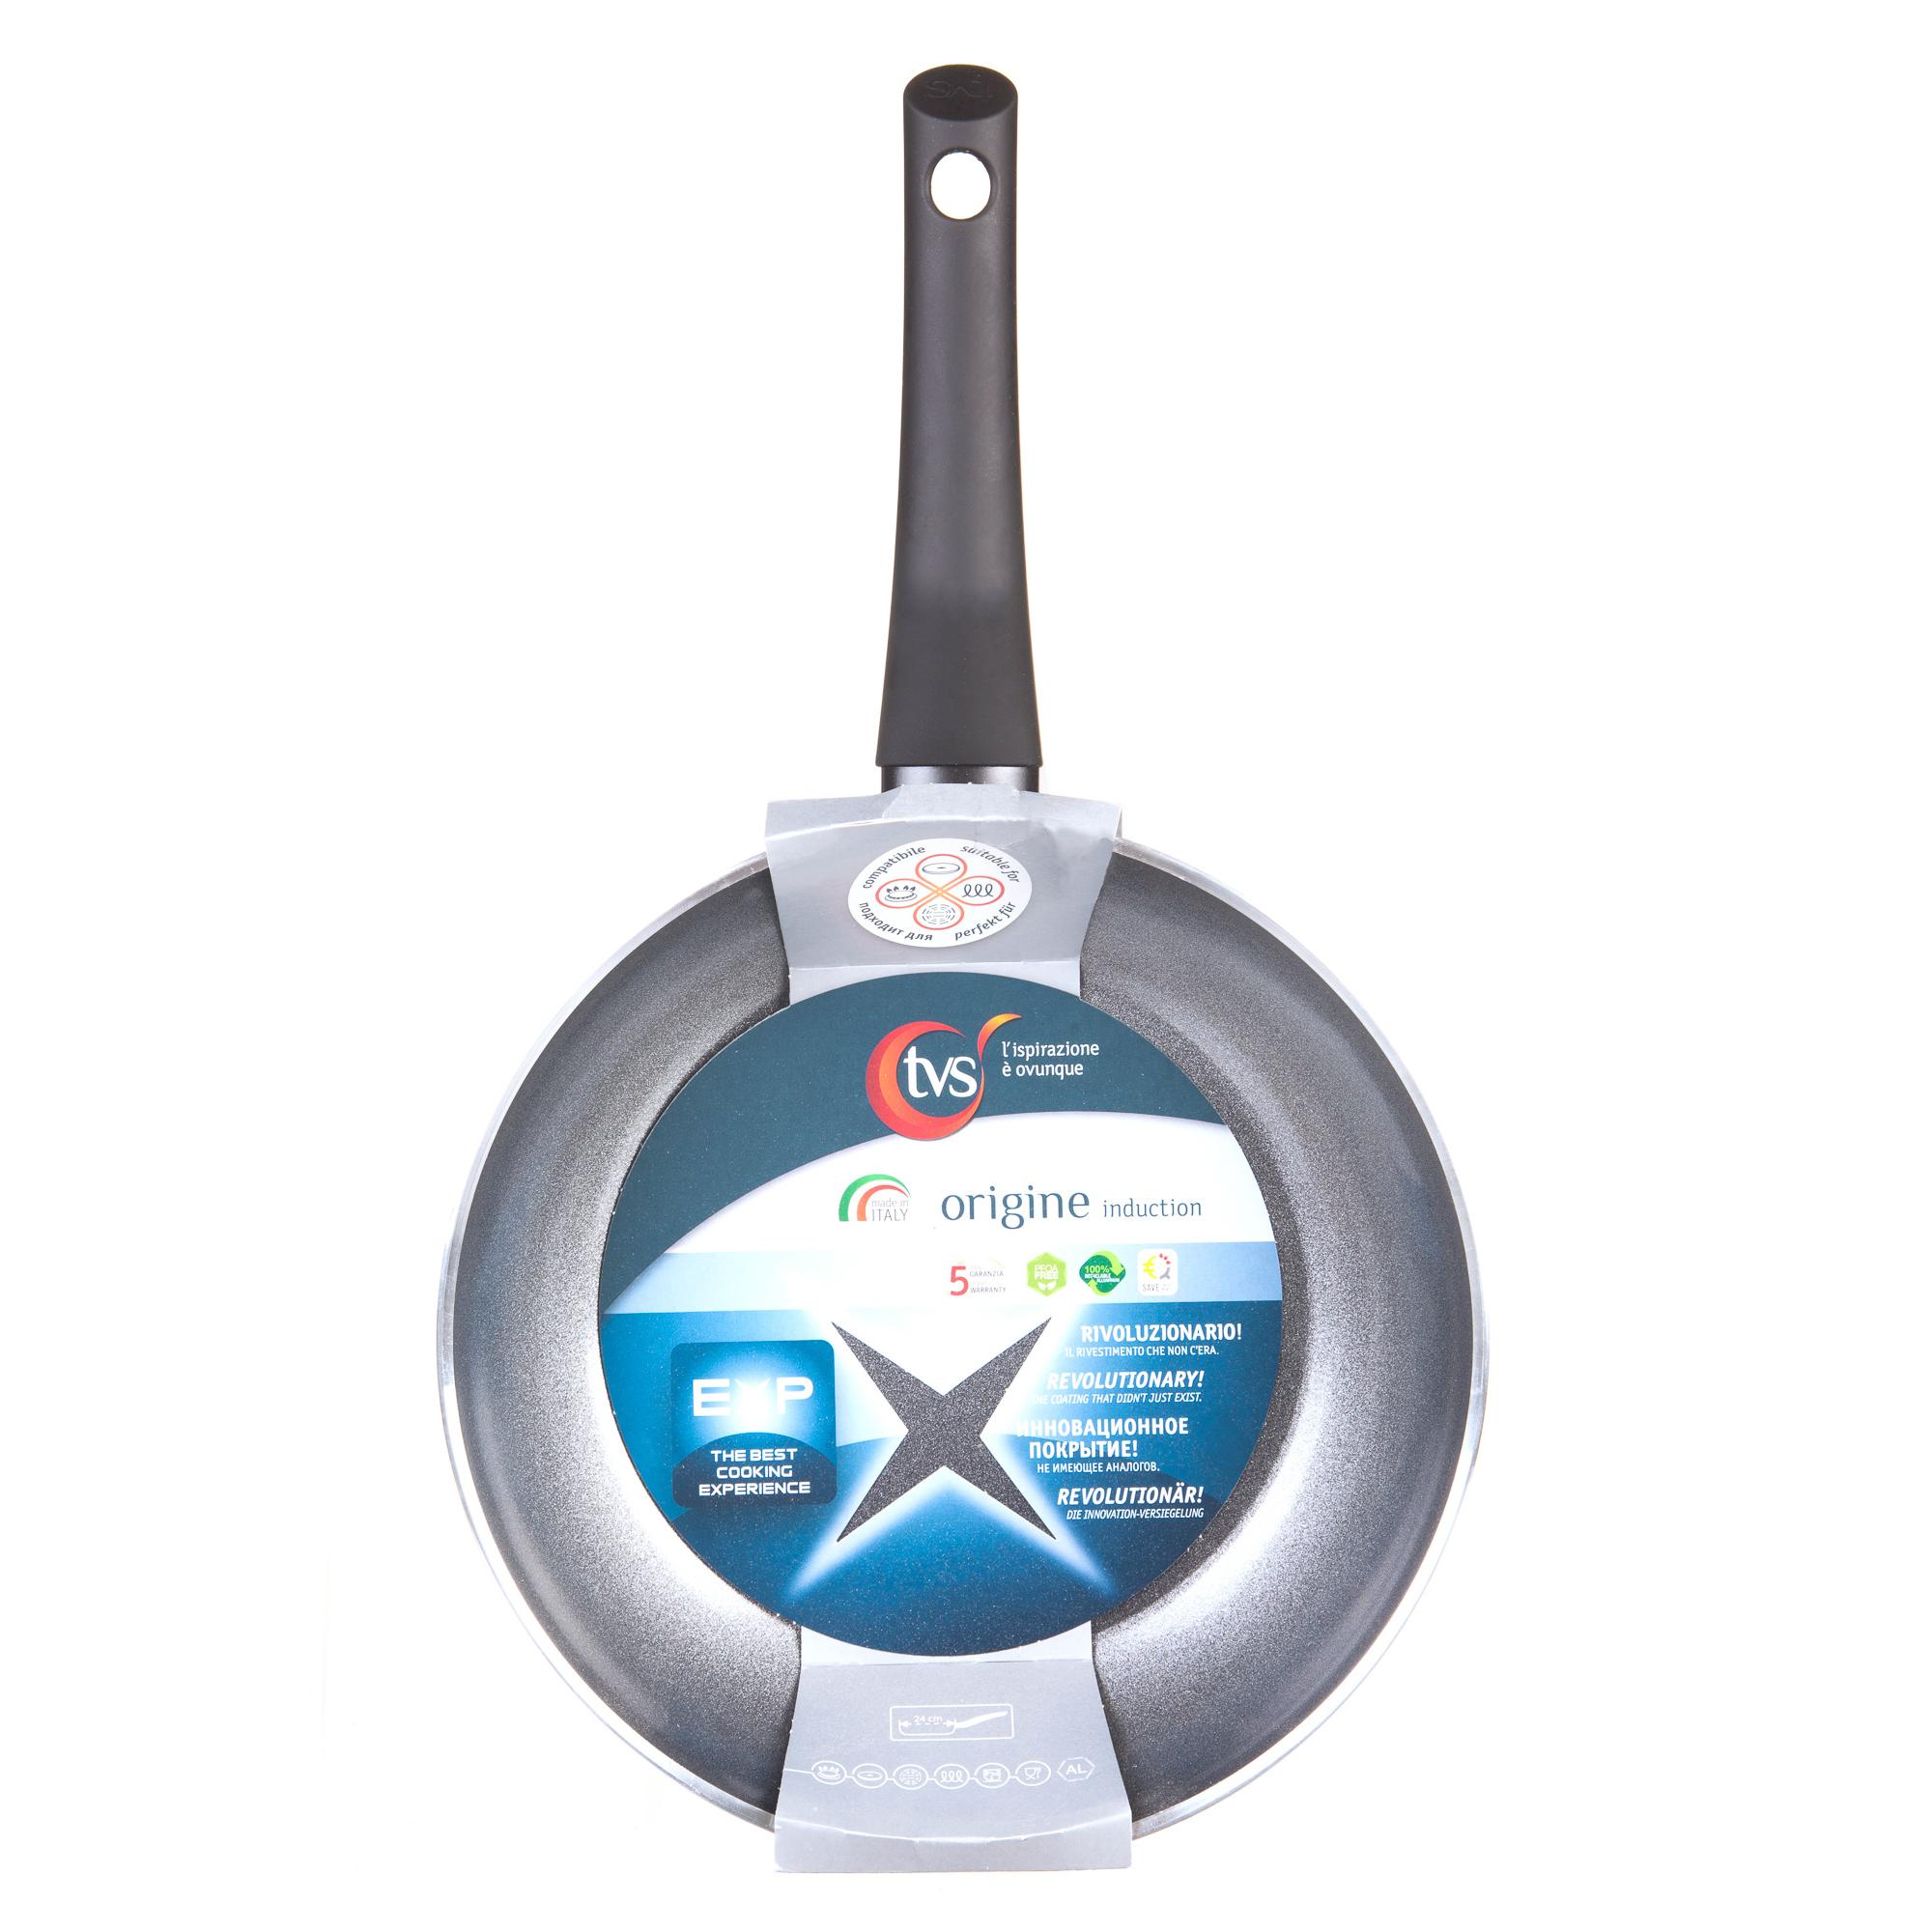 Сковорода Tvs origine 24 см 4N163243310001 сковорода d 24 см kukmara кофейный мрамор смки240а